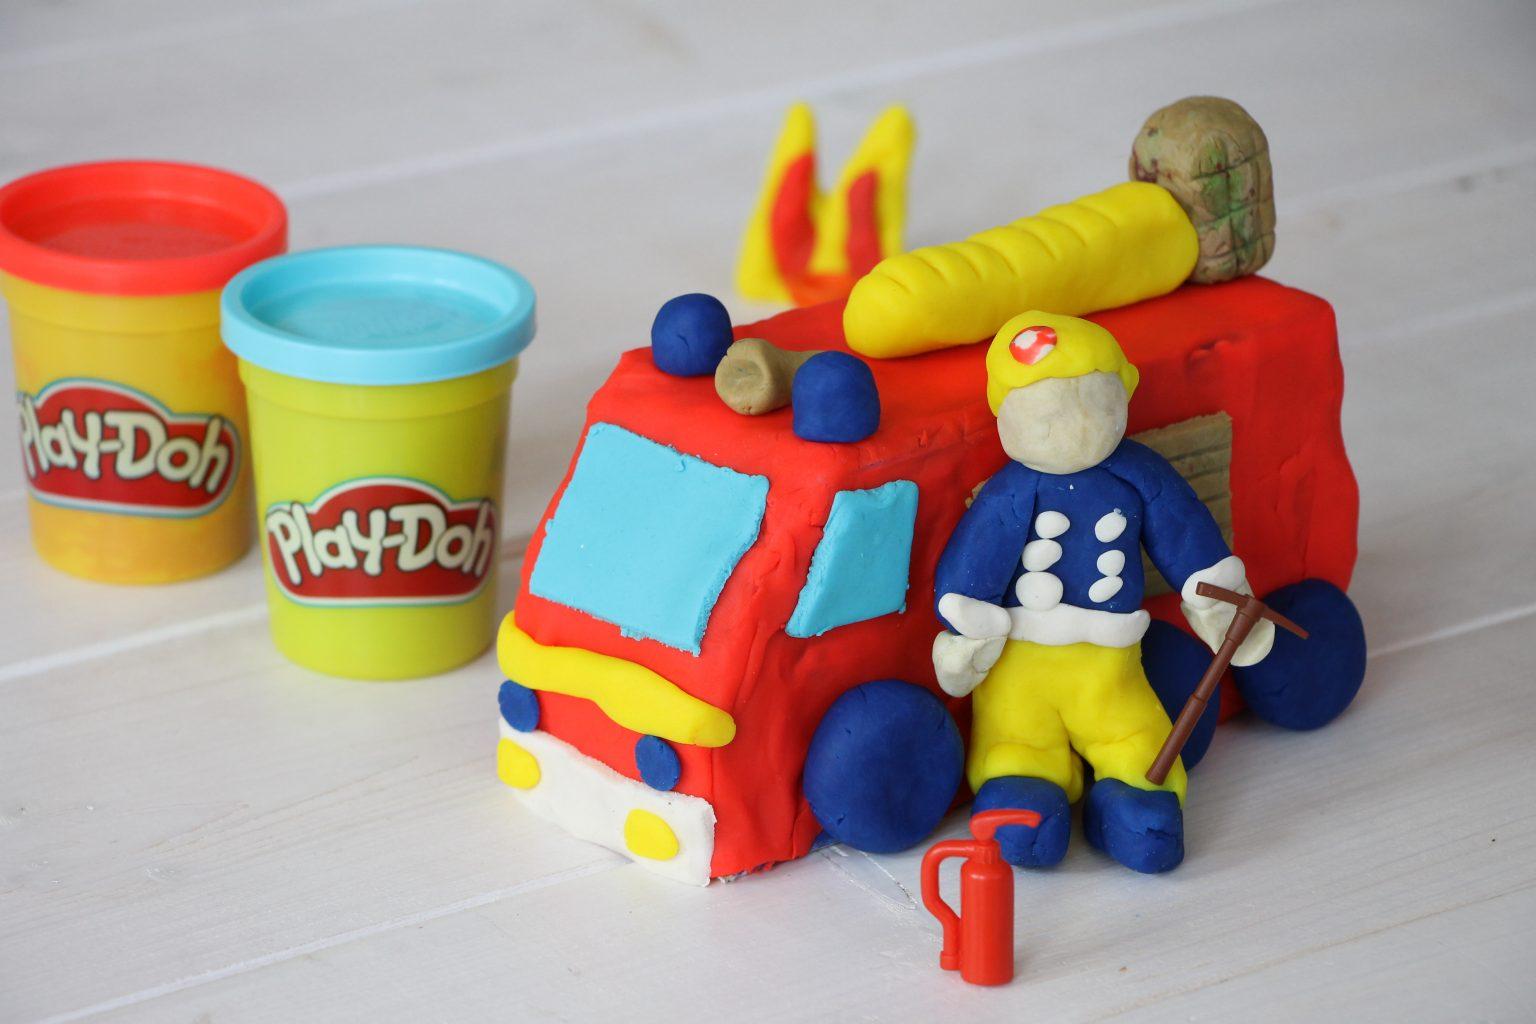 Play-Doh Kindergartenpreis 2018